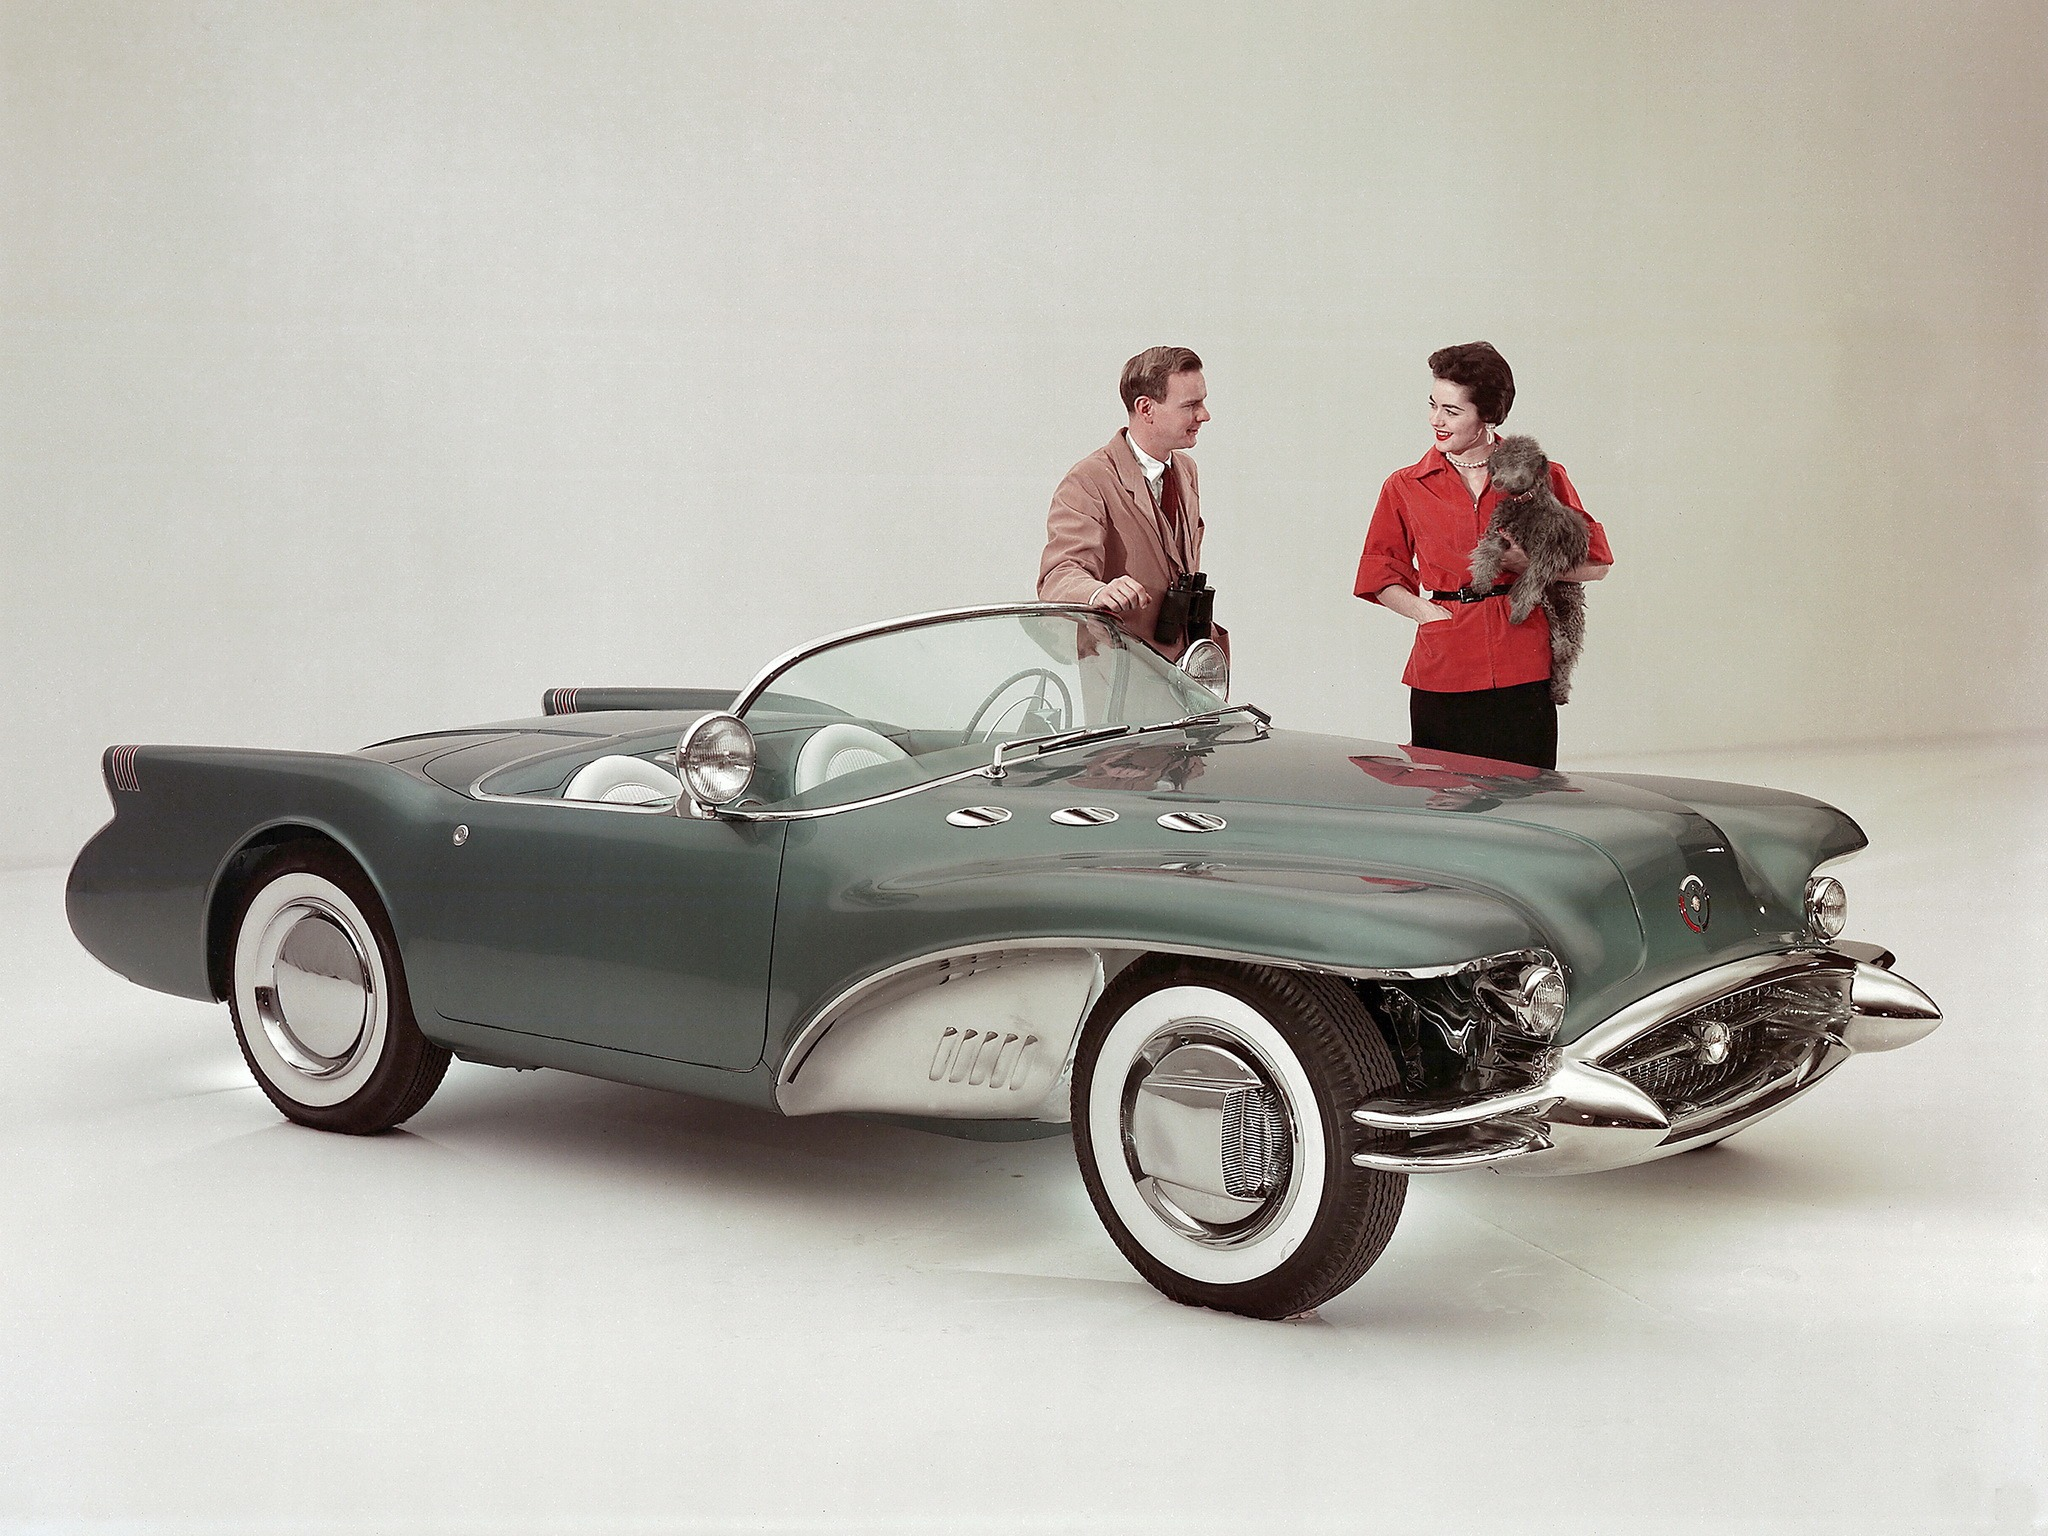 Buick Wildcat Ii 1954 Old Concept Cars